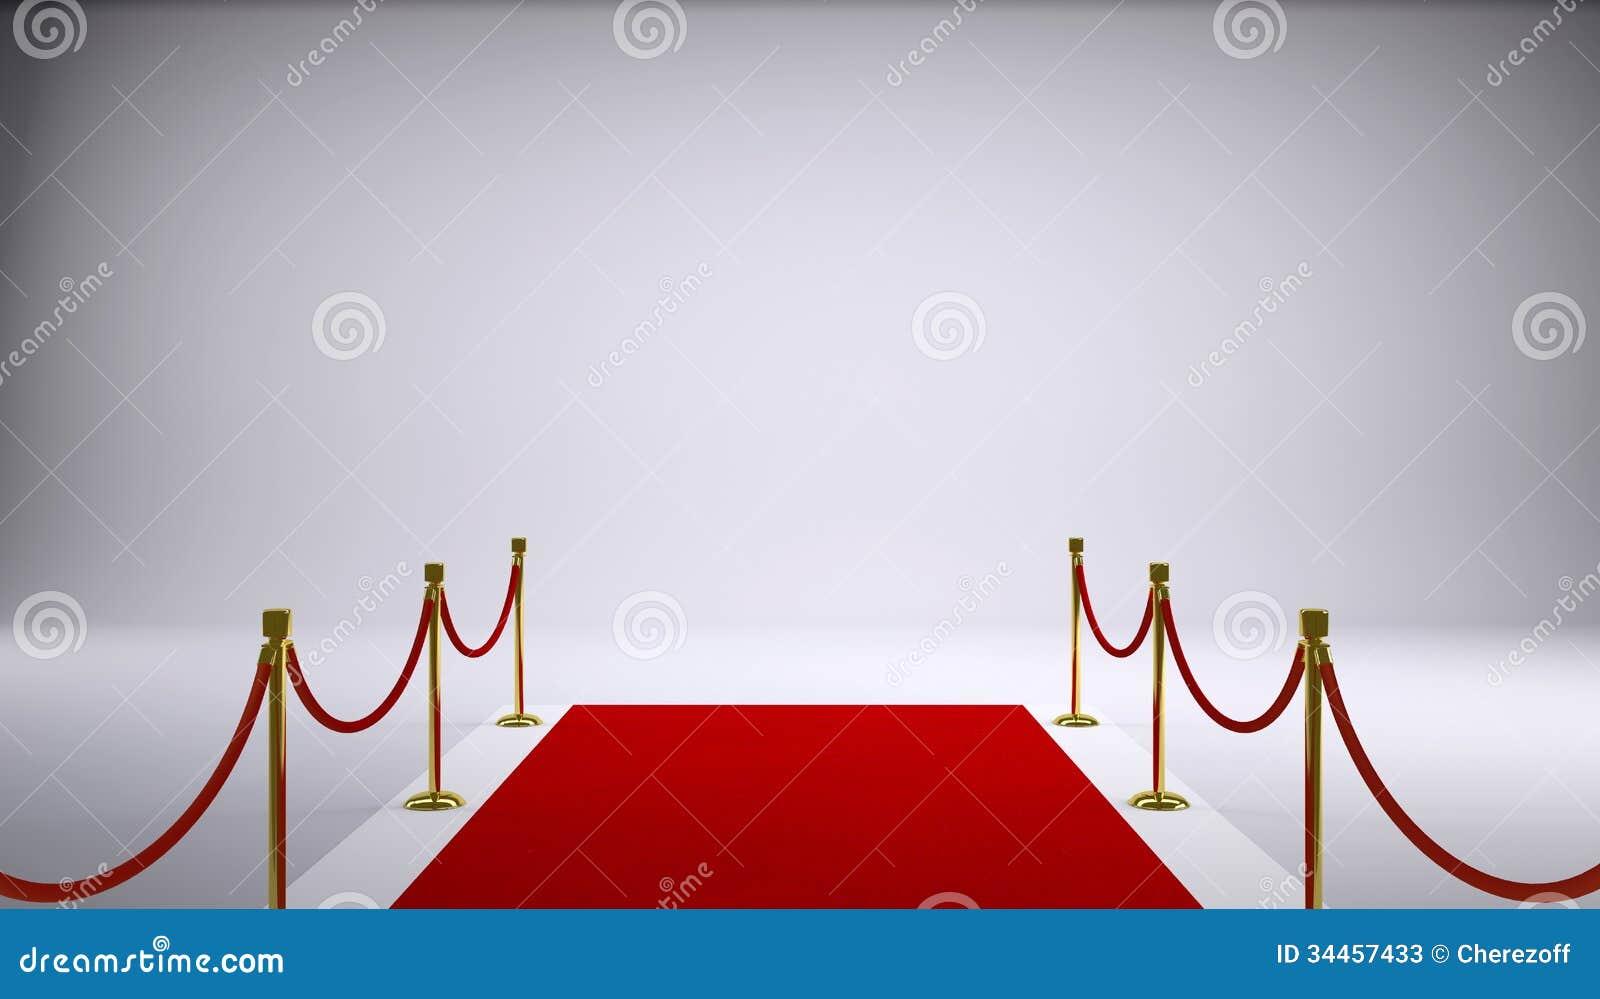 La alfombra roja fondo gris imagen de archivo imagen for Alfombra persa roja